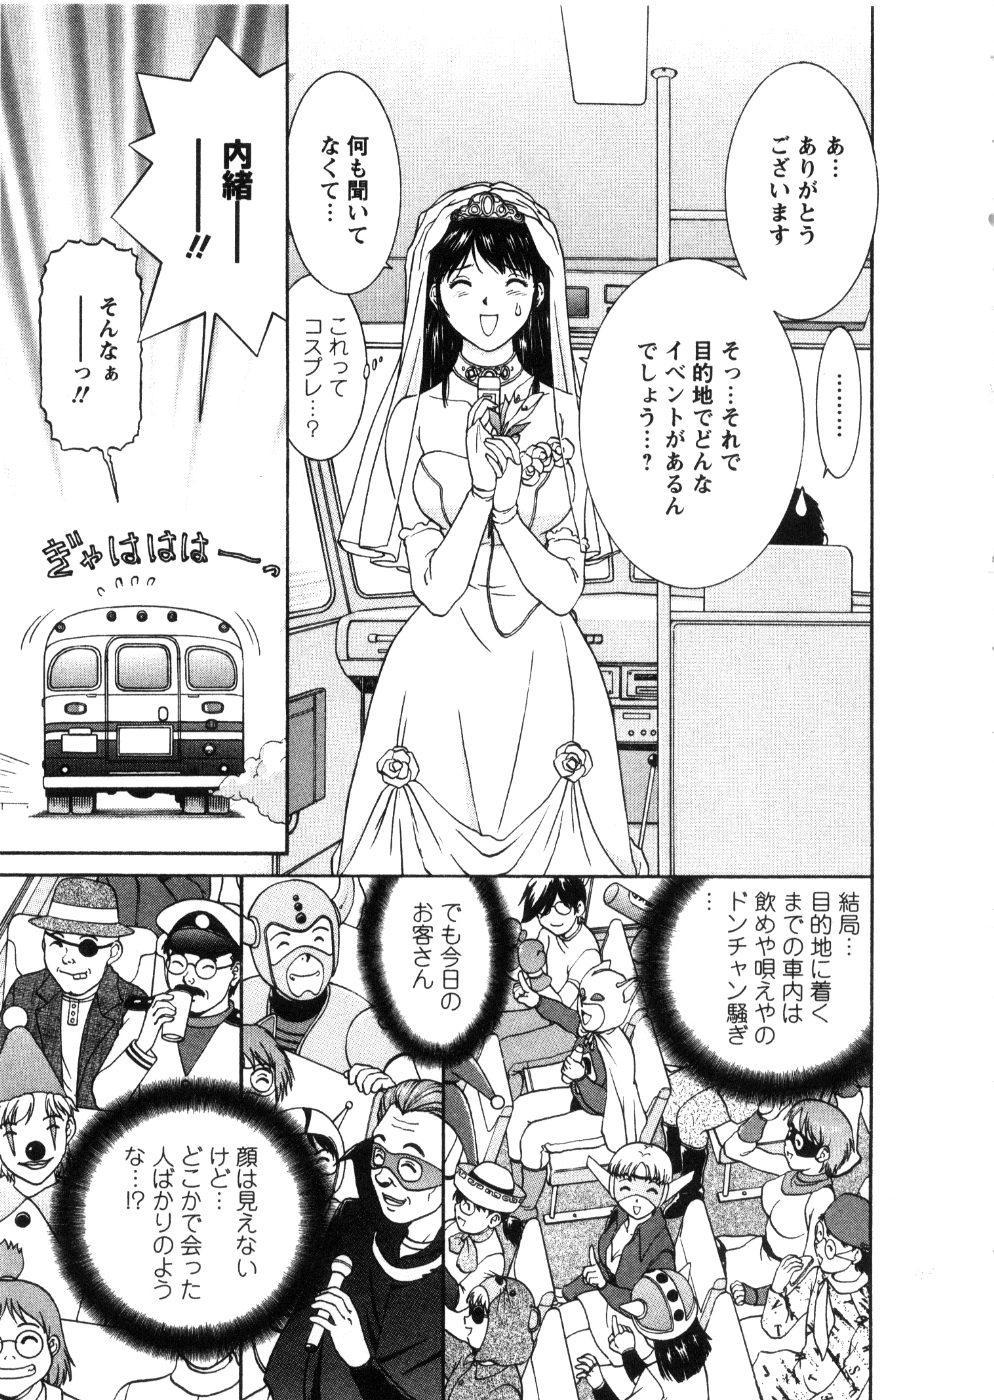 Oneechan-tachi ga Yatte Kuru 03 178